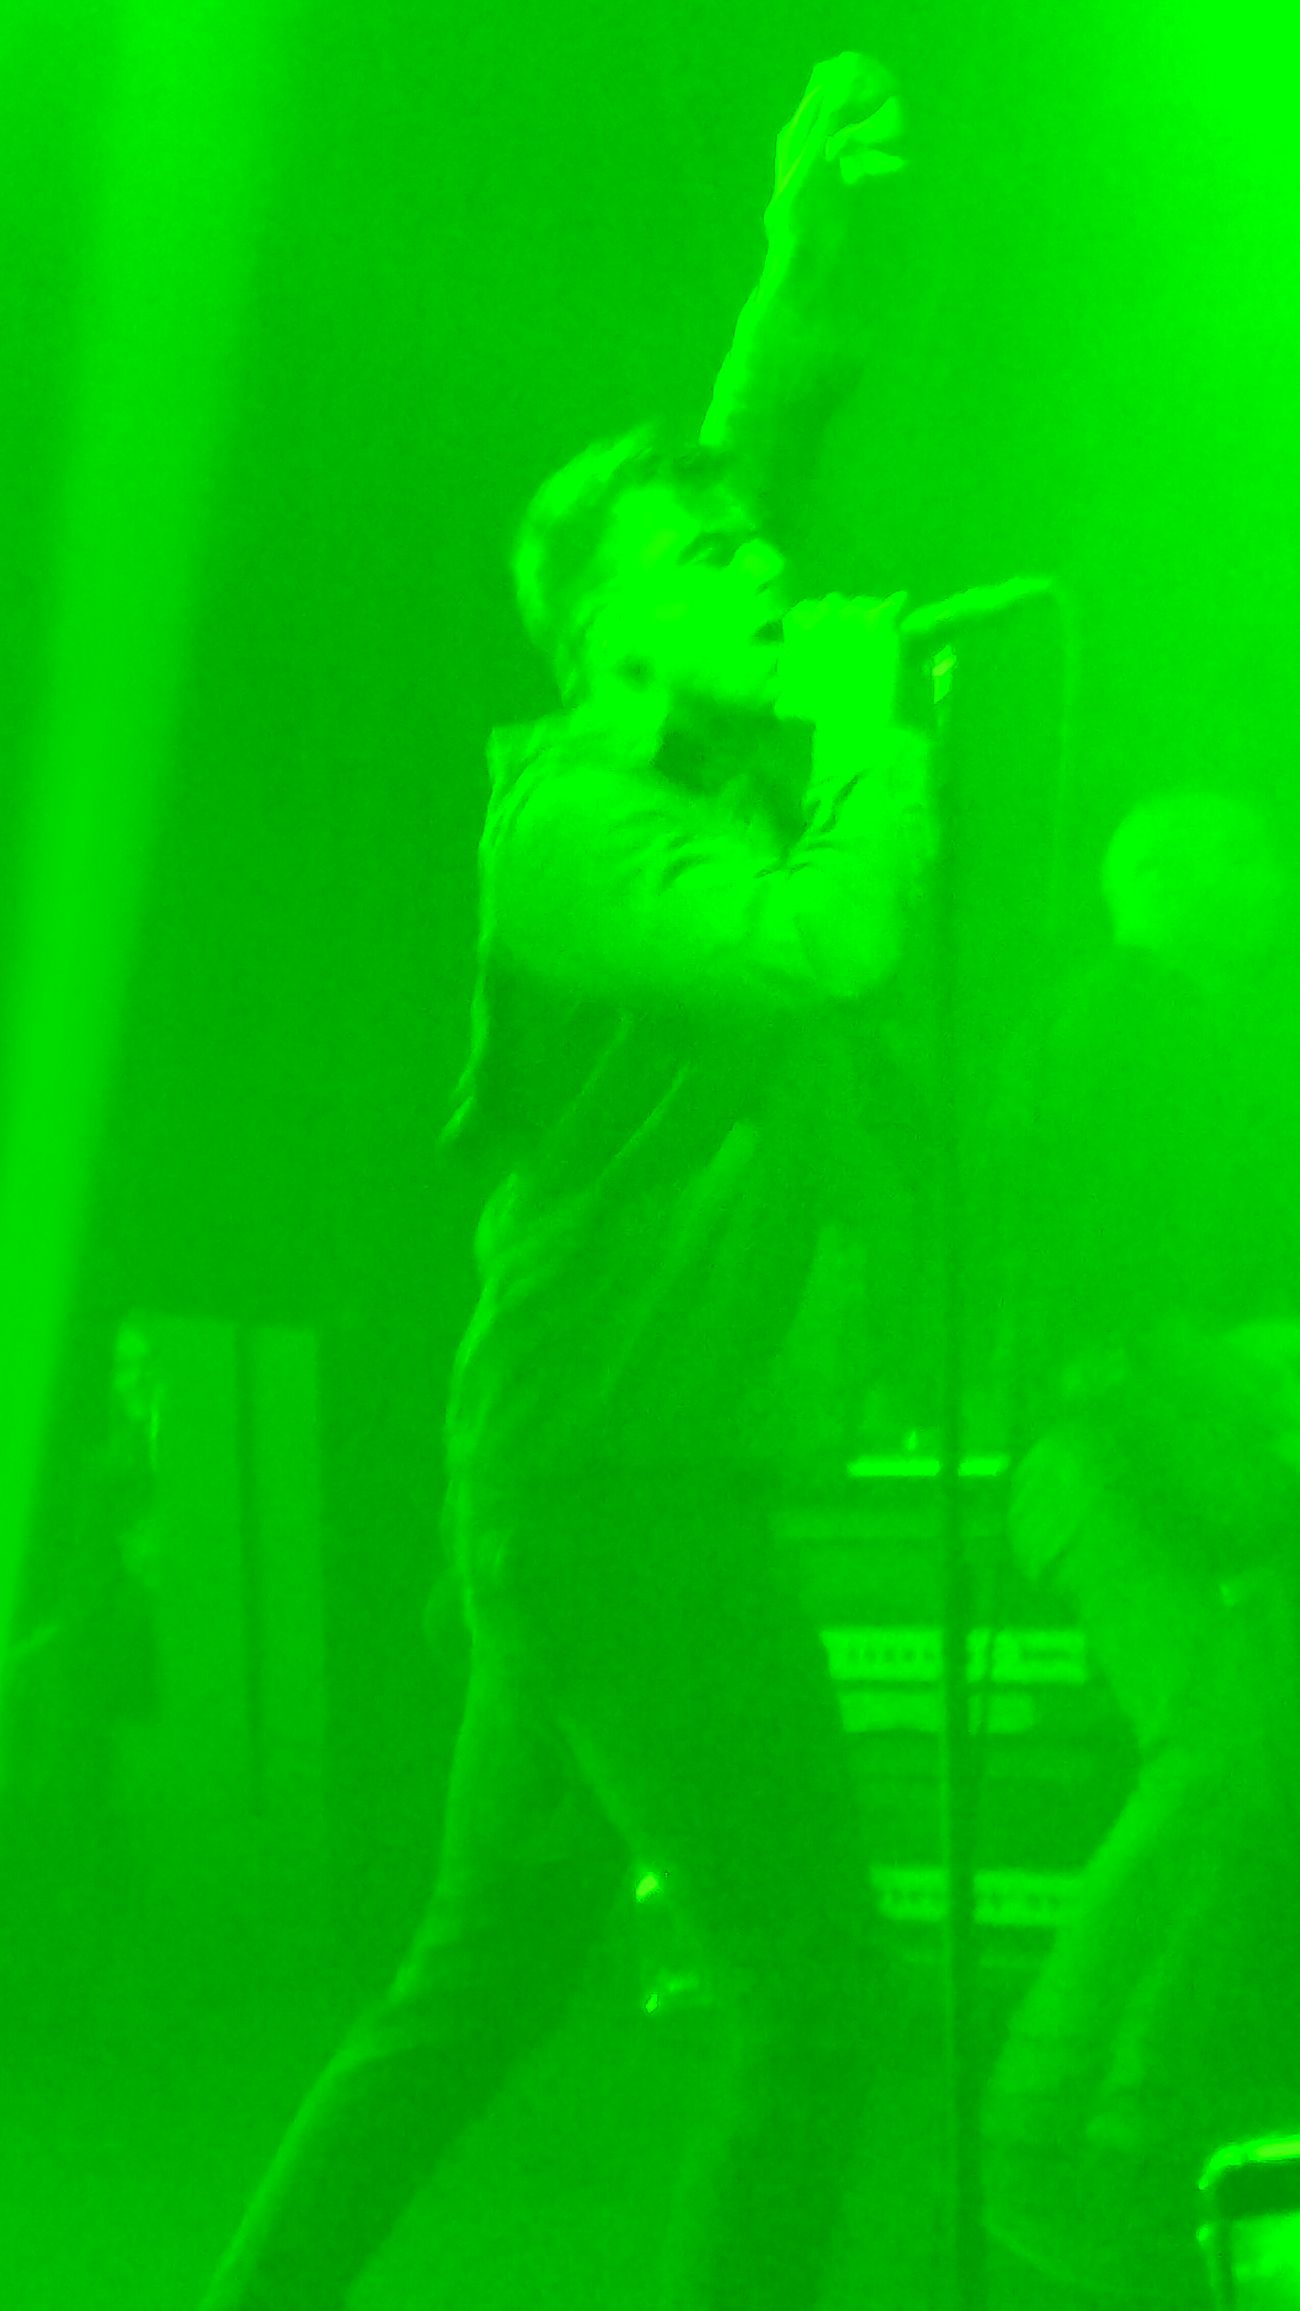 Lemon Lime By Motorola Accidental Camera Malfunction Concert Photography Anthony Green Circa Survive Music Worship